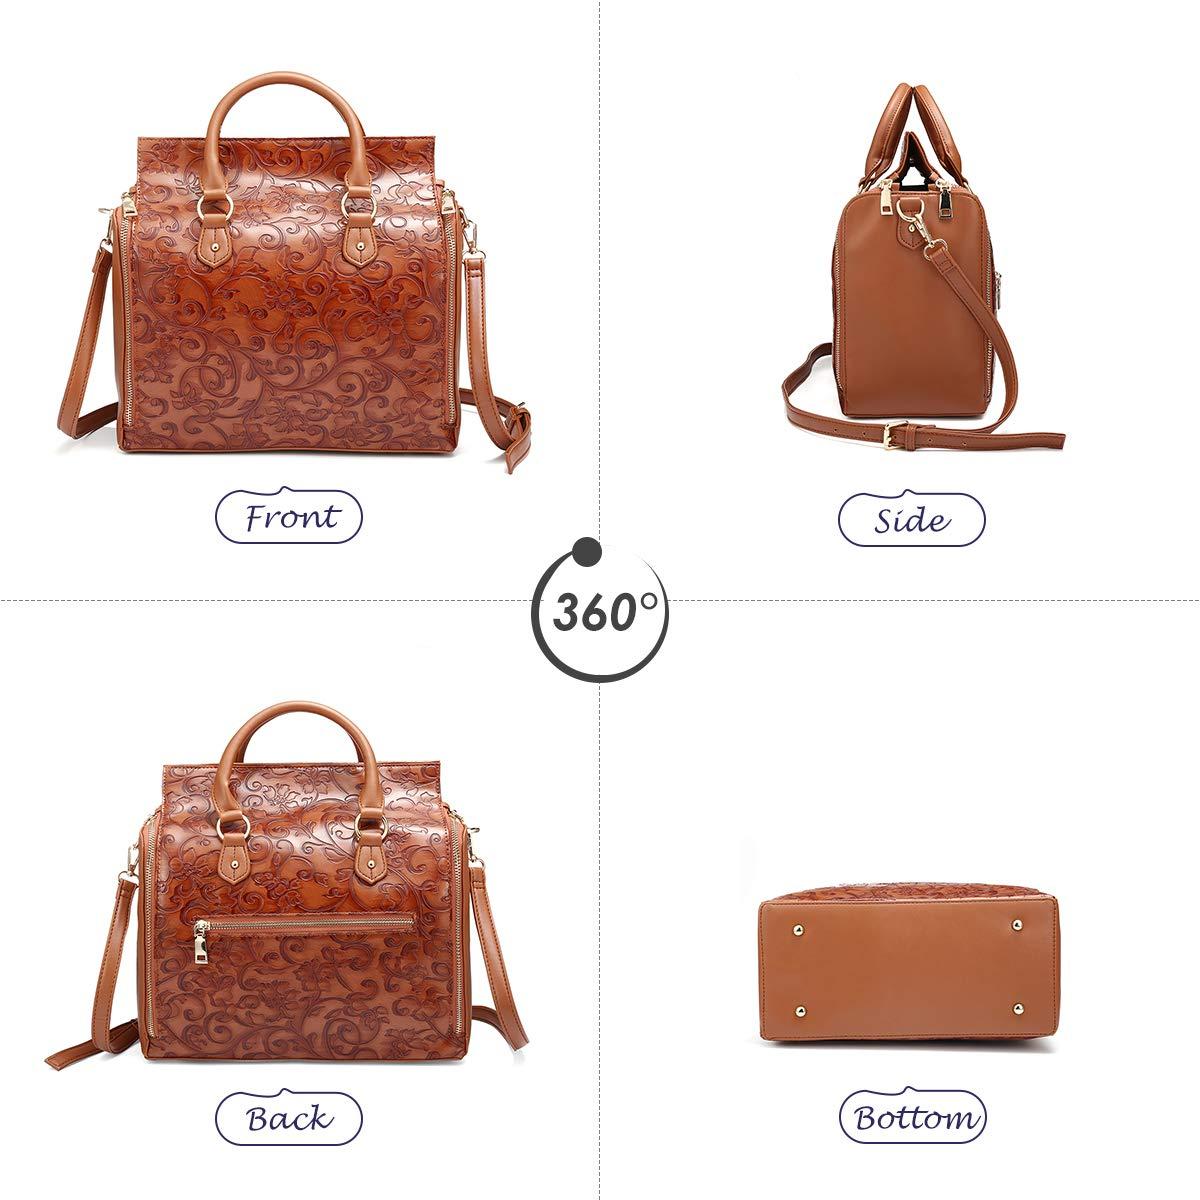 83e934c85a0a Brenice Travel Makeup Bag, Embossed Flower Handbags Vintage Large Capacity  Leather Bohemian...